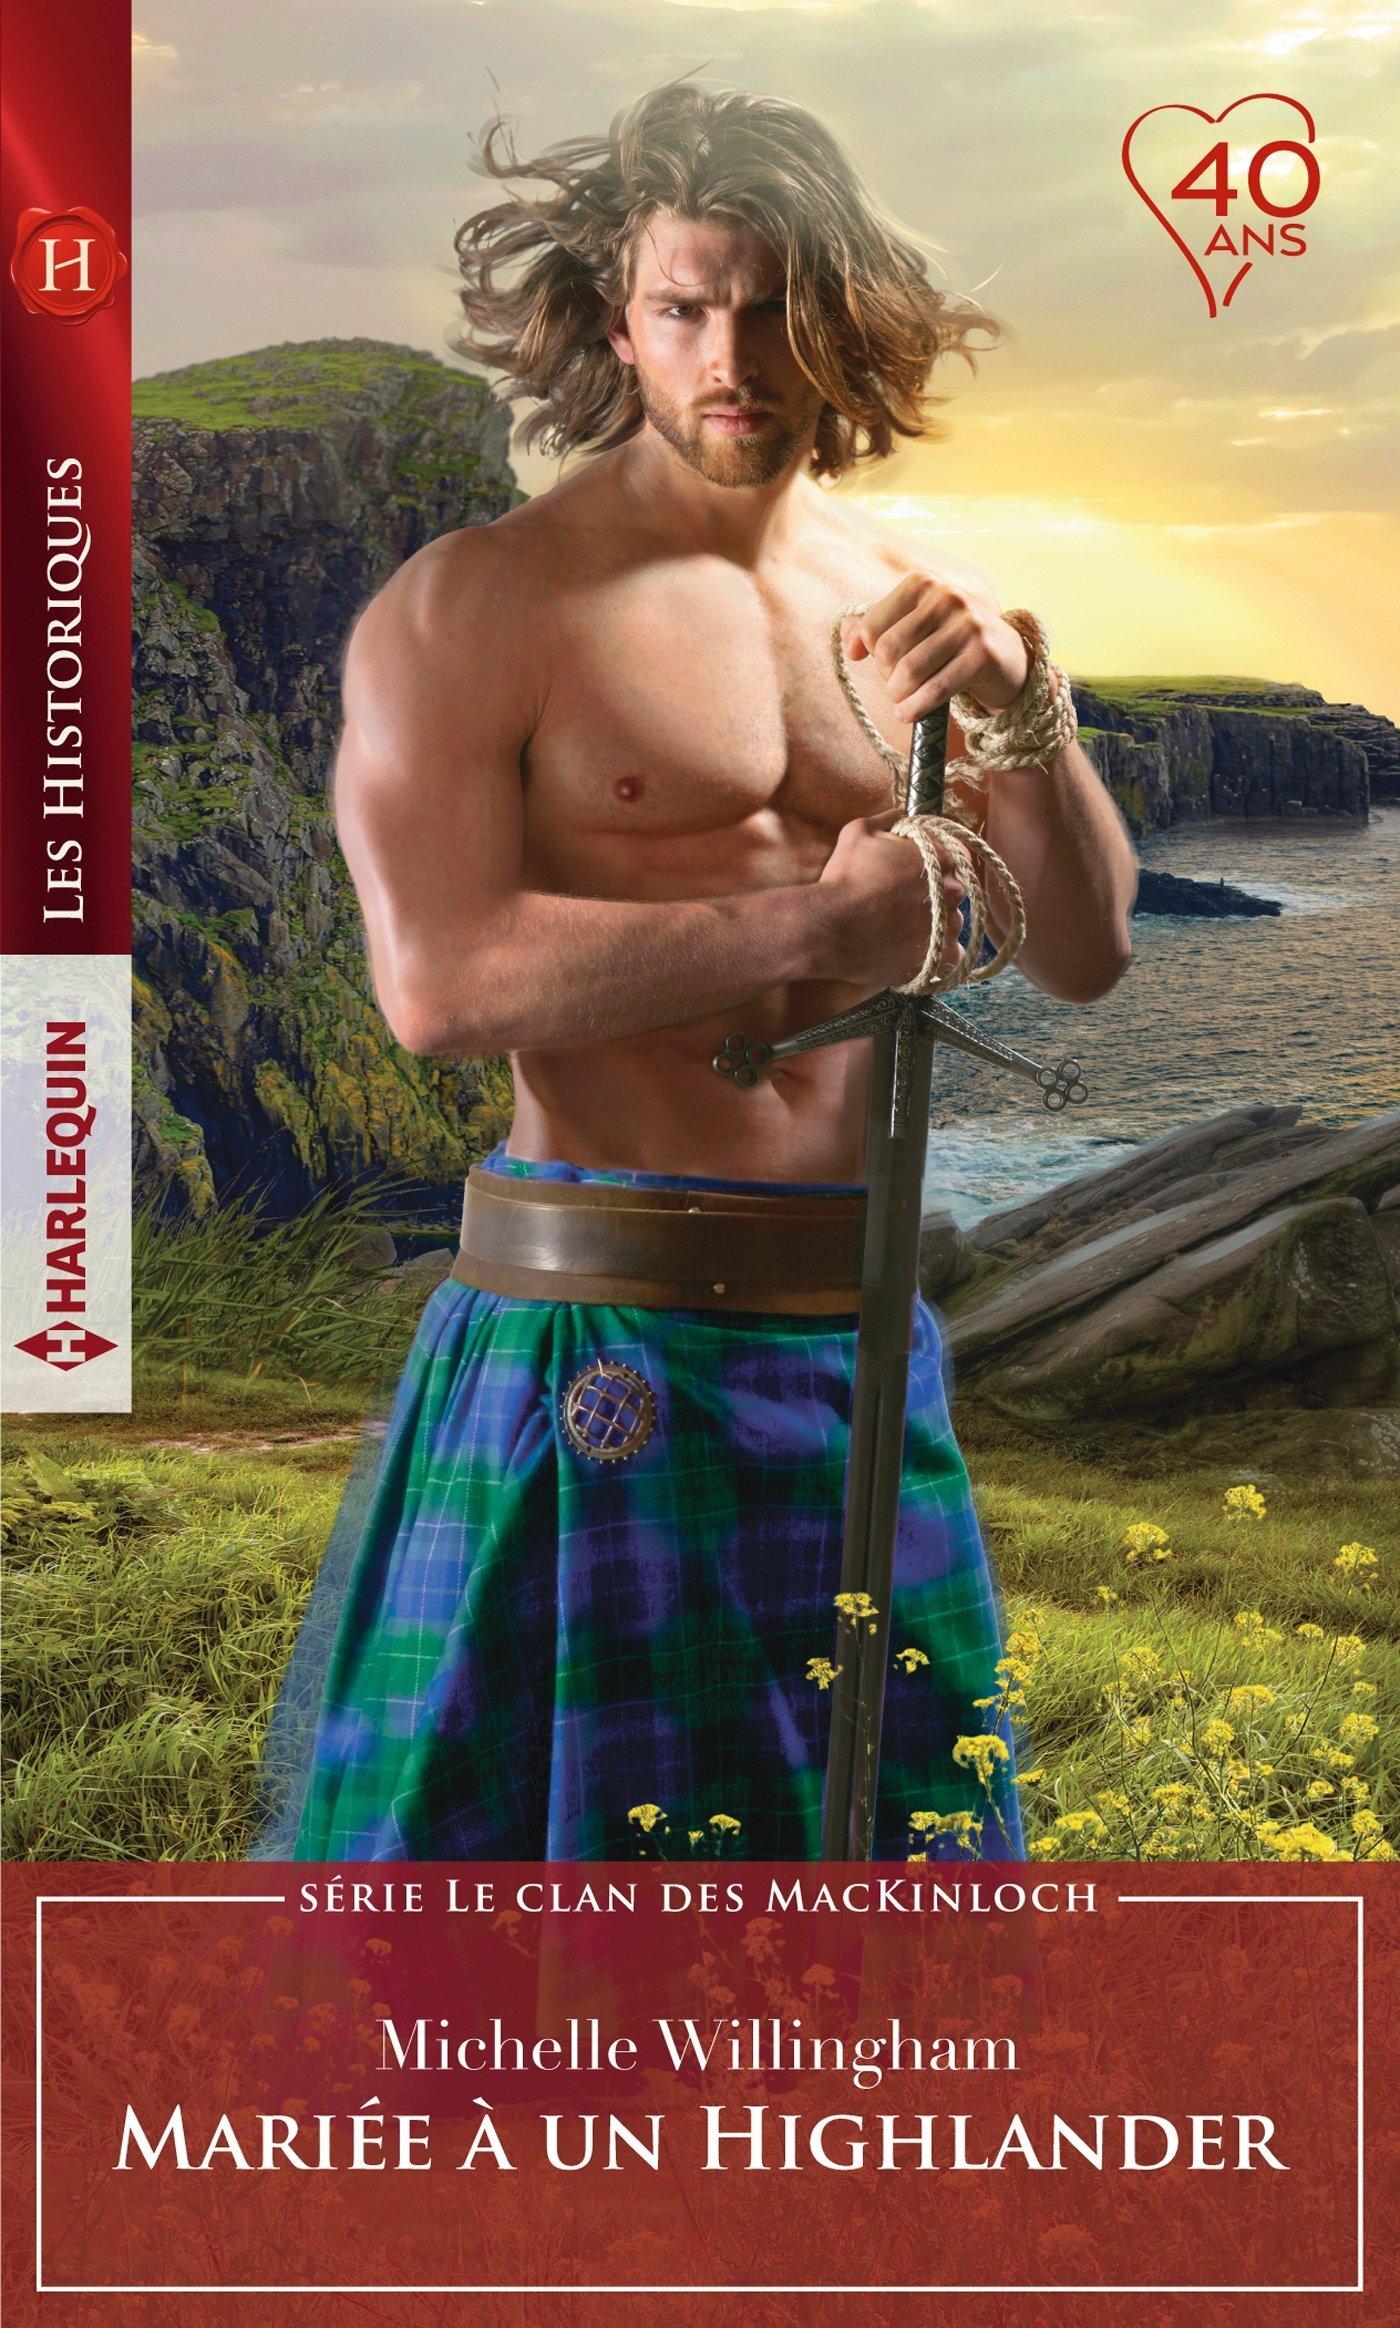 cdn1.booknode.com/book_cover/1132/full/le-clan-des-mackinloch-tome-1-mariee-a-un-highlander-1132496.jpg